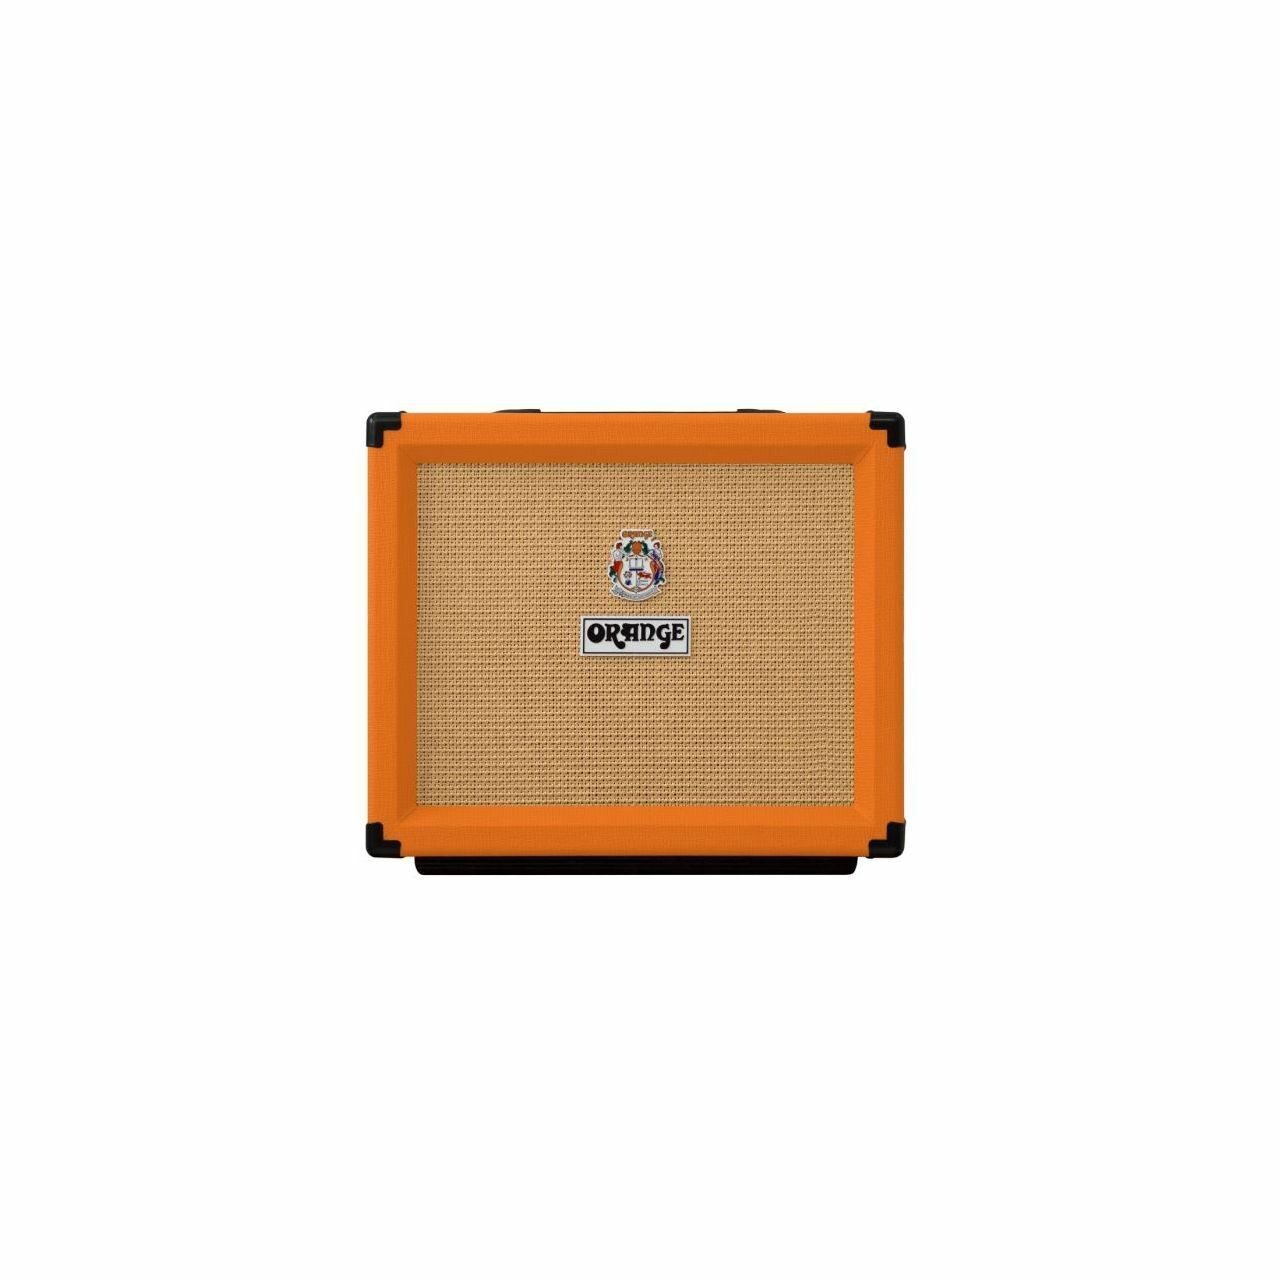 ORANGE Rocker 15 - Amplifier for Electric Guitar